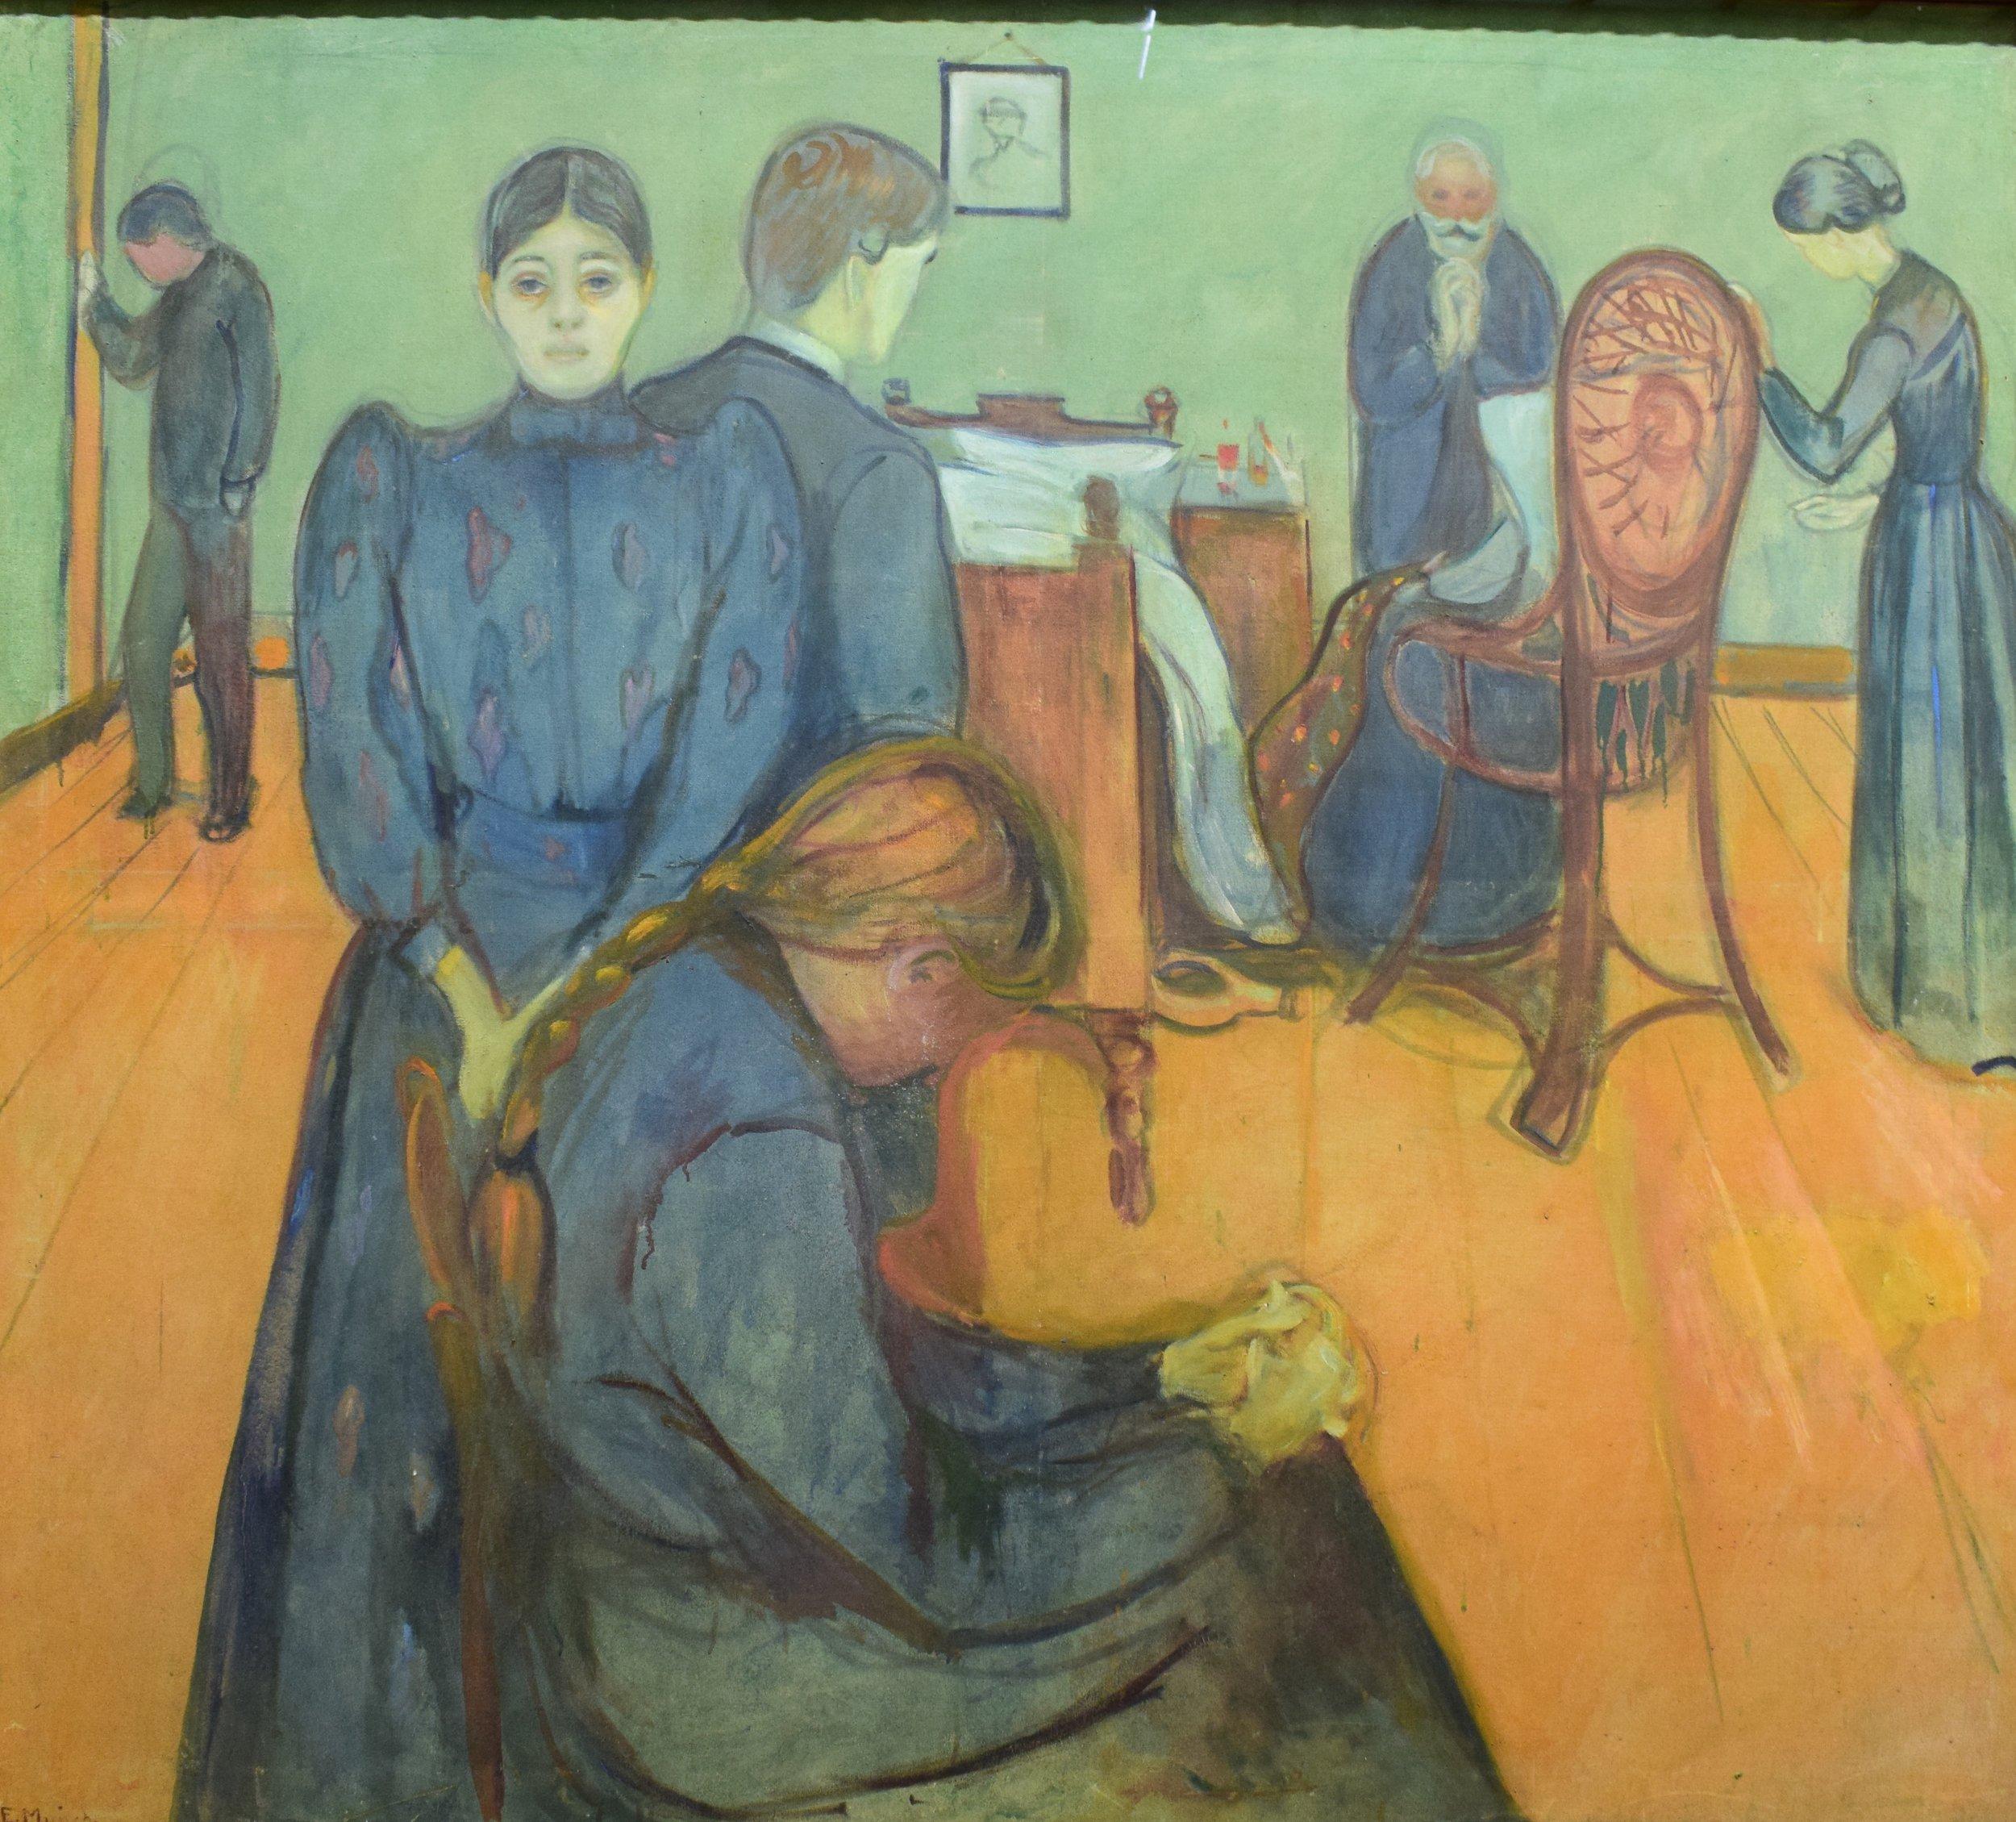 Edvard Munch, Death in the Sickroom, 1893, Nasjonalmuseet